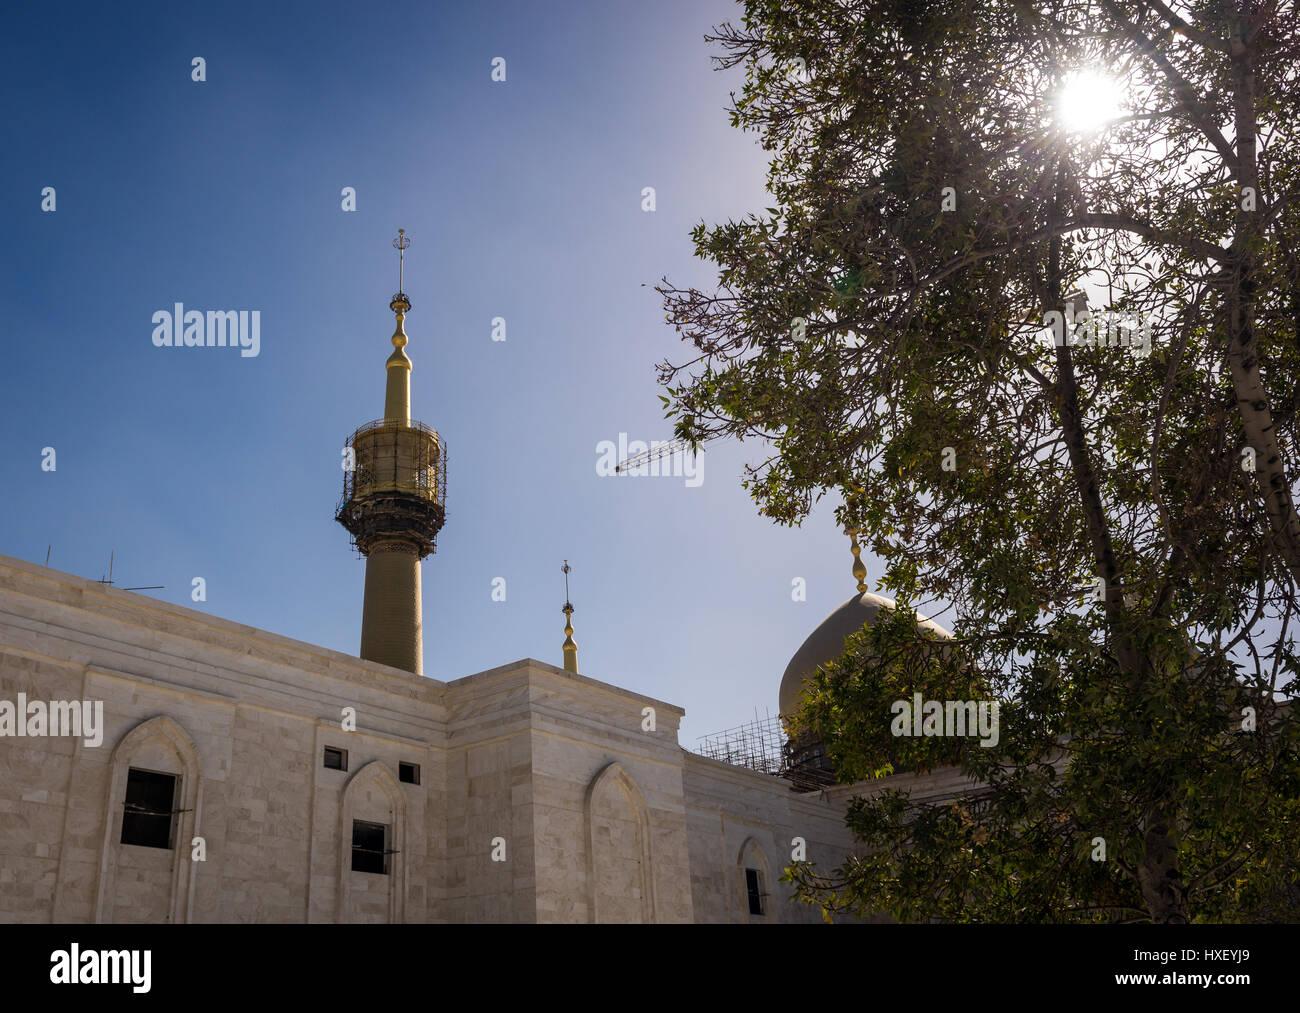 Non Muslim Perspective On The Revolution Of Imam Hussain: Ruhollah Khomeini Stock Photos & Ruhollah Khomeini Stock